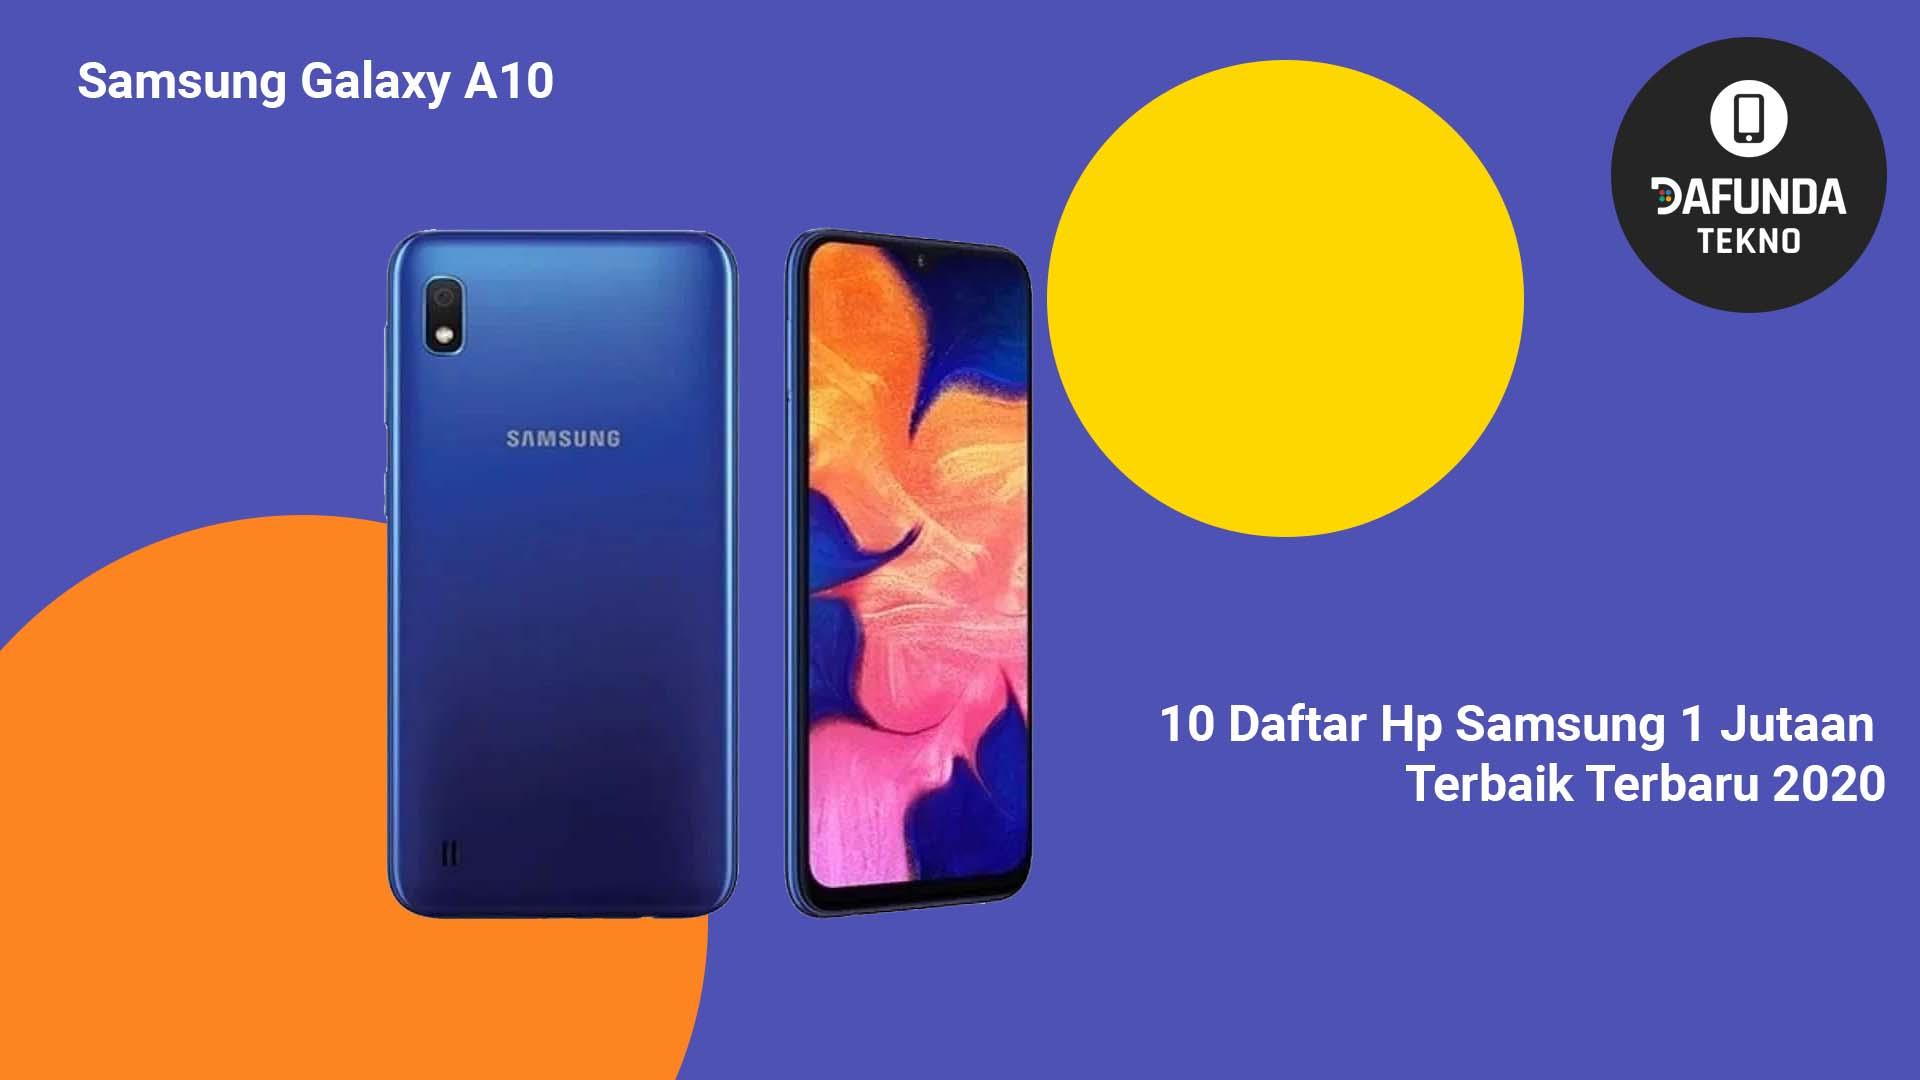 Hp Samsung 1 Jutaan Terbaik Samsung Galaxy A10